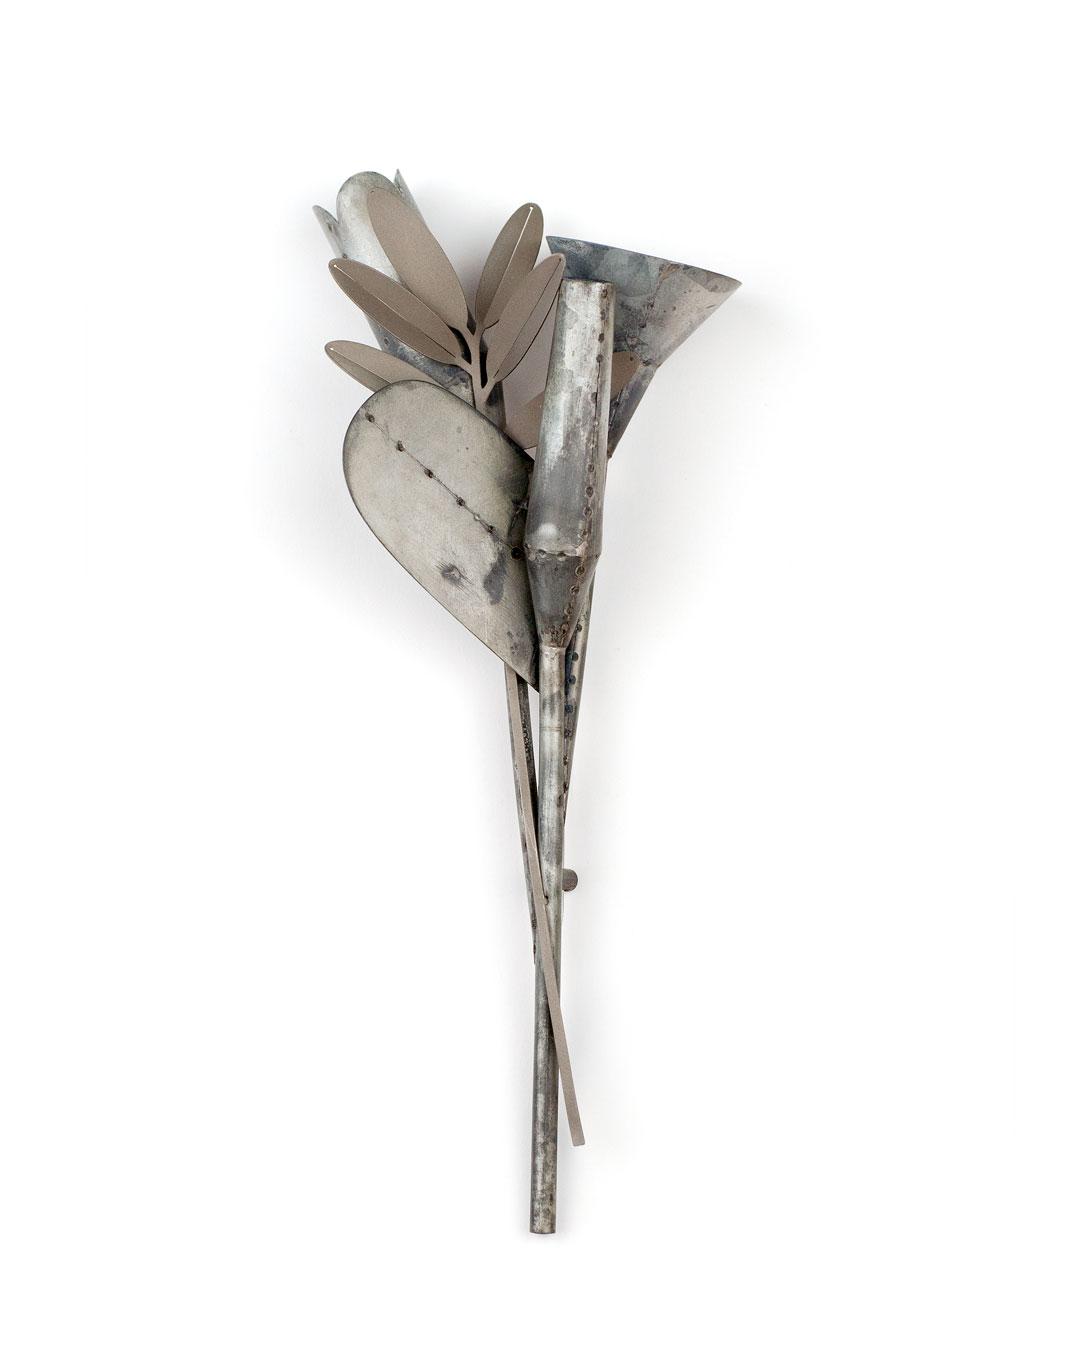 Junwon Jung, Flower 3, 2013, brooch; titan zinc, steel, 220 x 70 x 30 mm, €1700